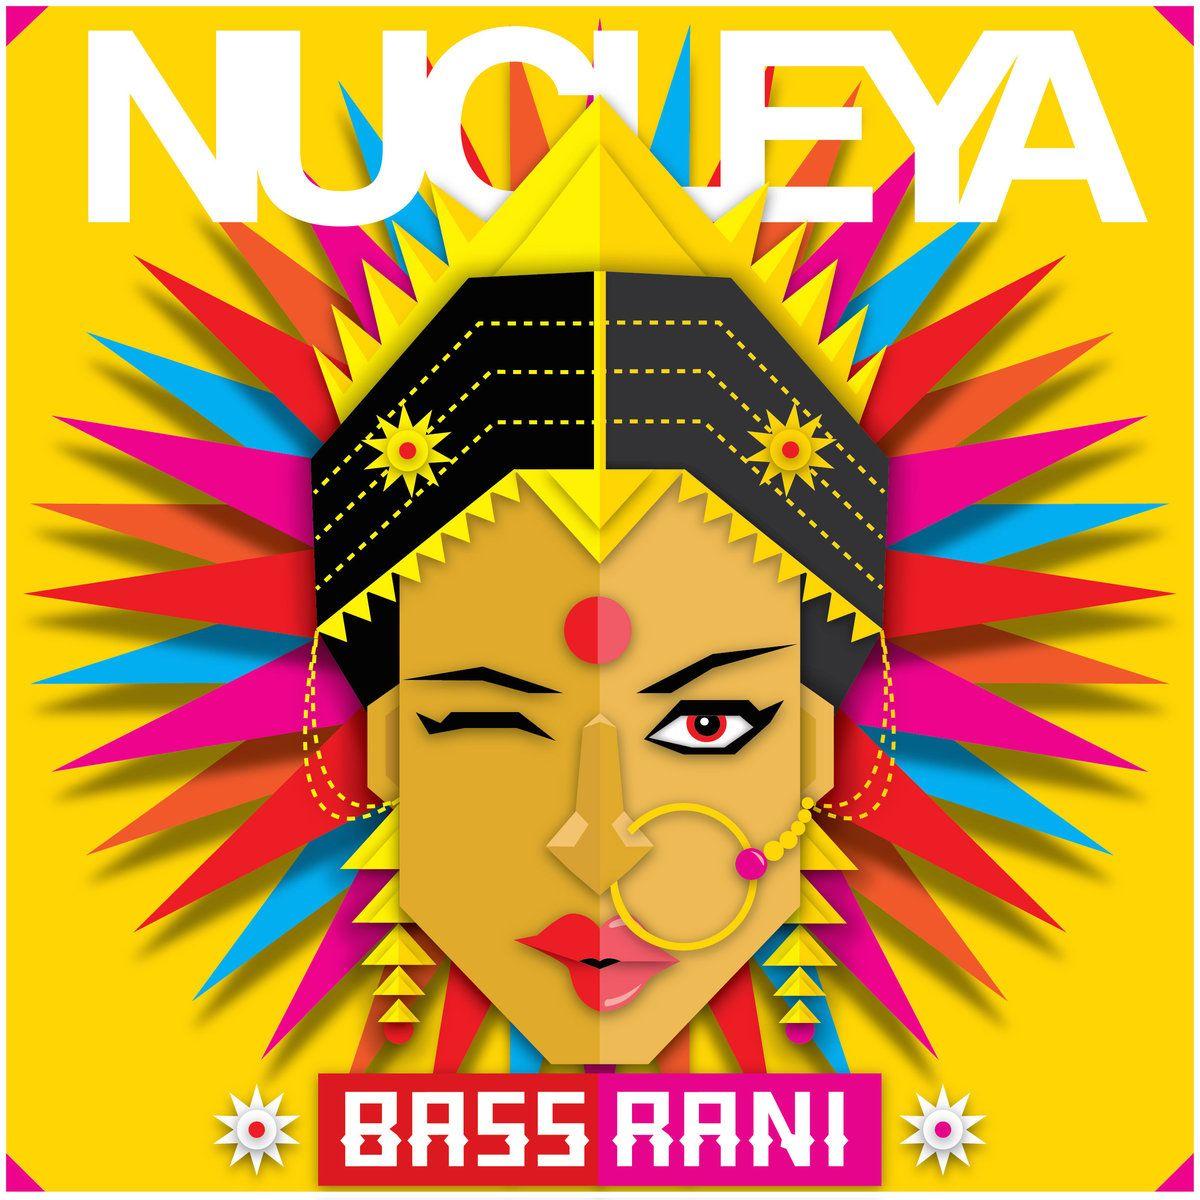 NUCLEYA Printing Press Album songs, Mp3 song, Music albums